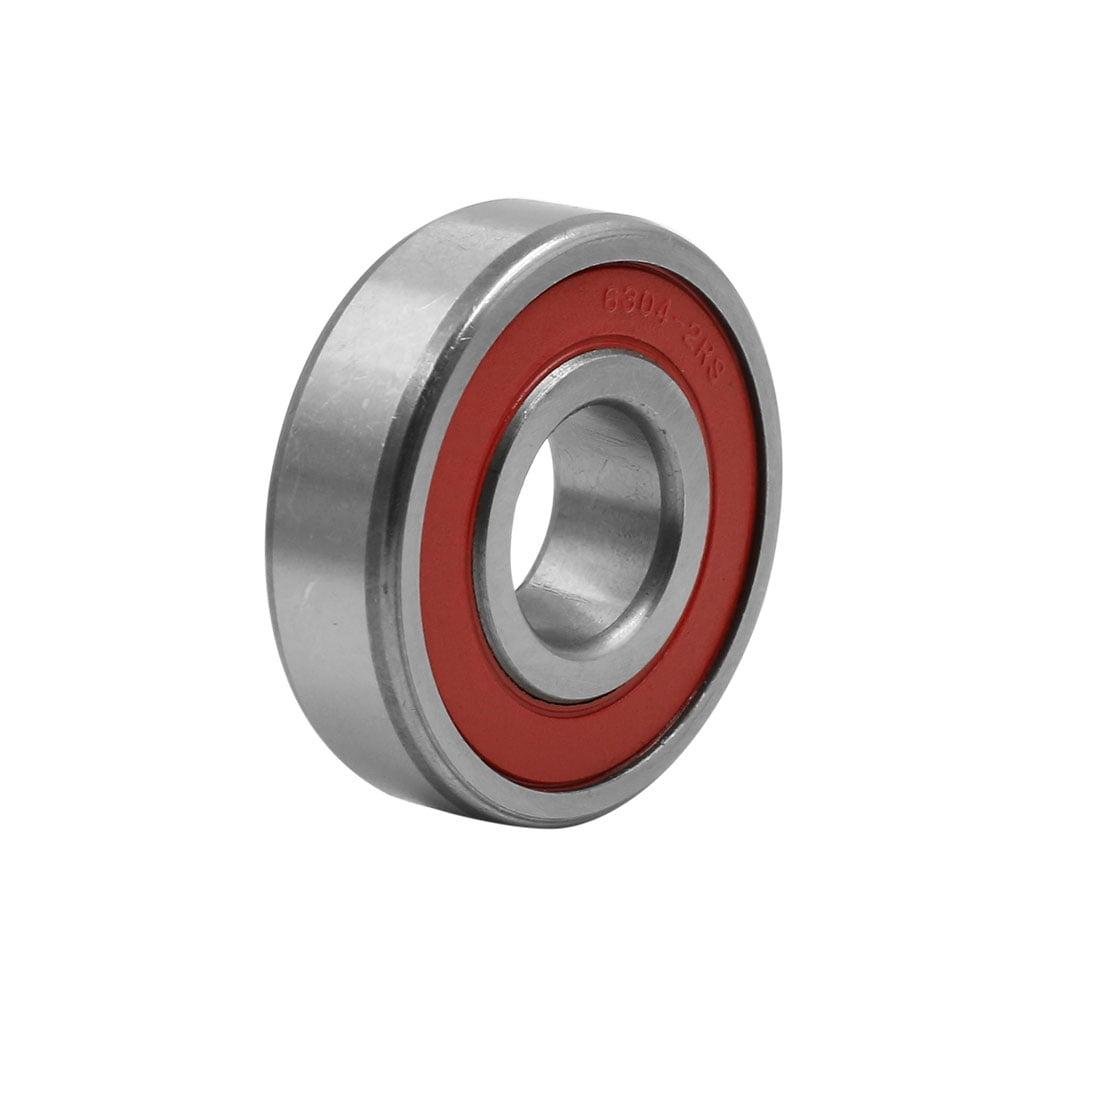 10pcs Universal 6304-2RS Deep Groove Double Shielded Ball Bearing 52 x 20 x 15mm - image 2 de 4